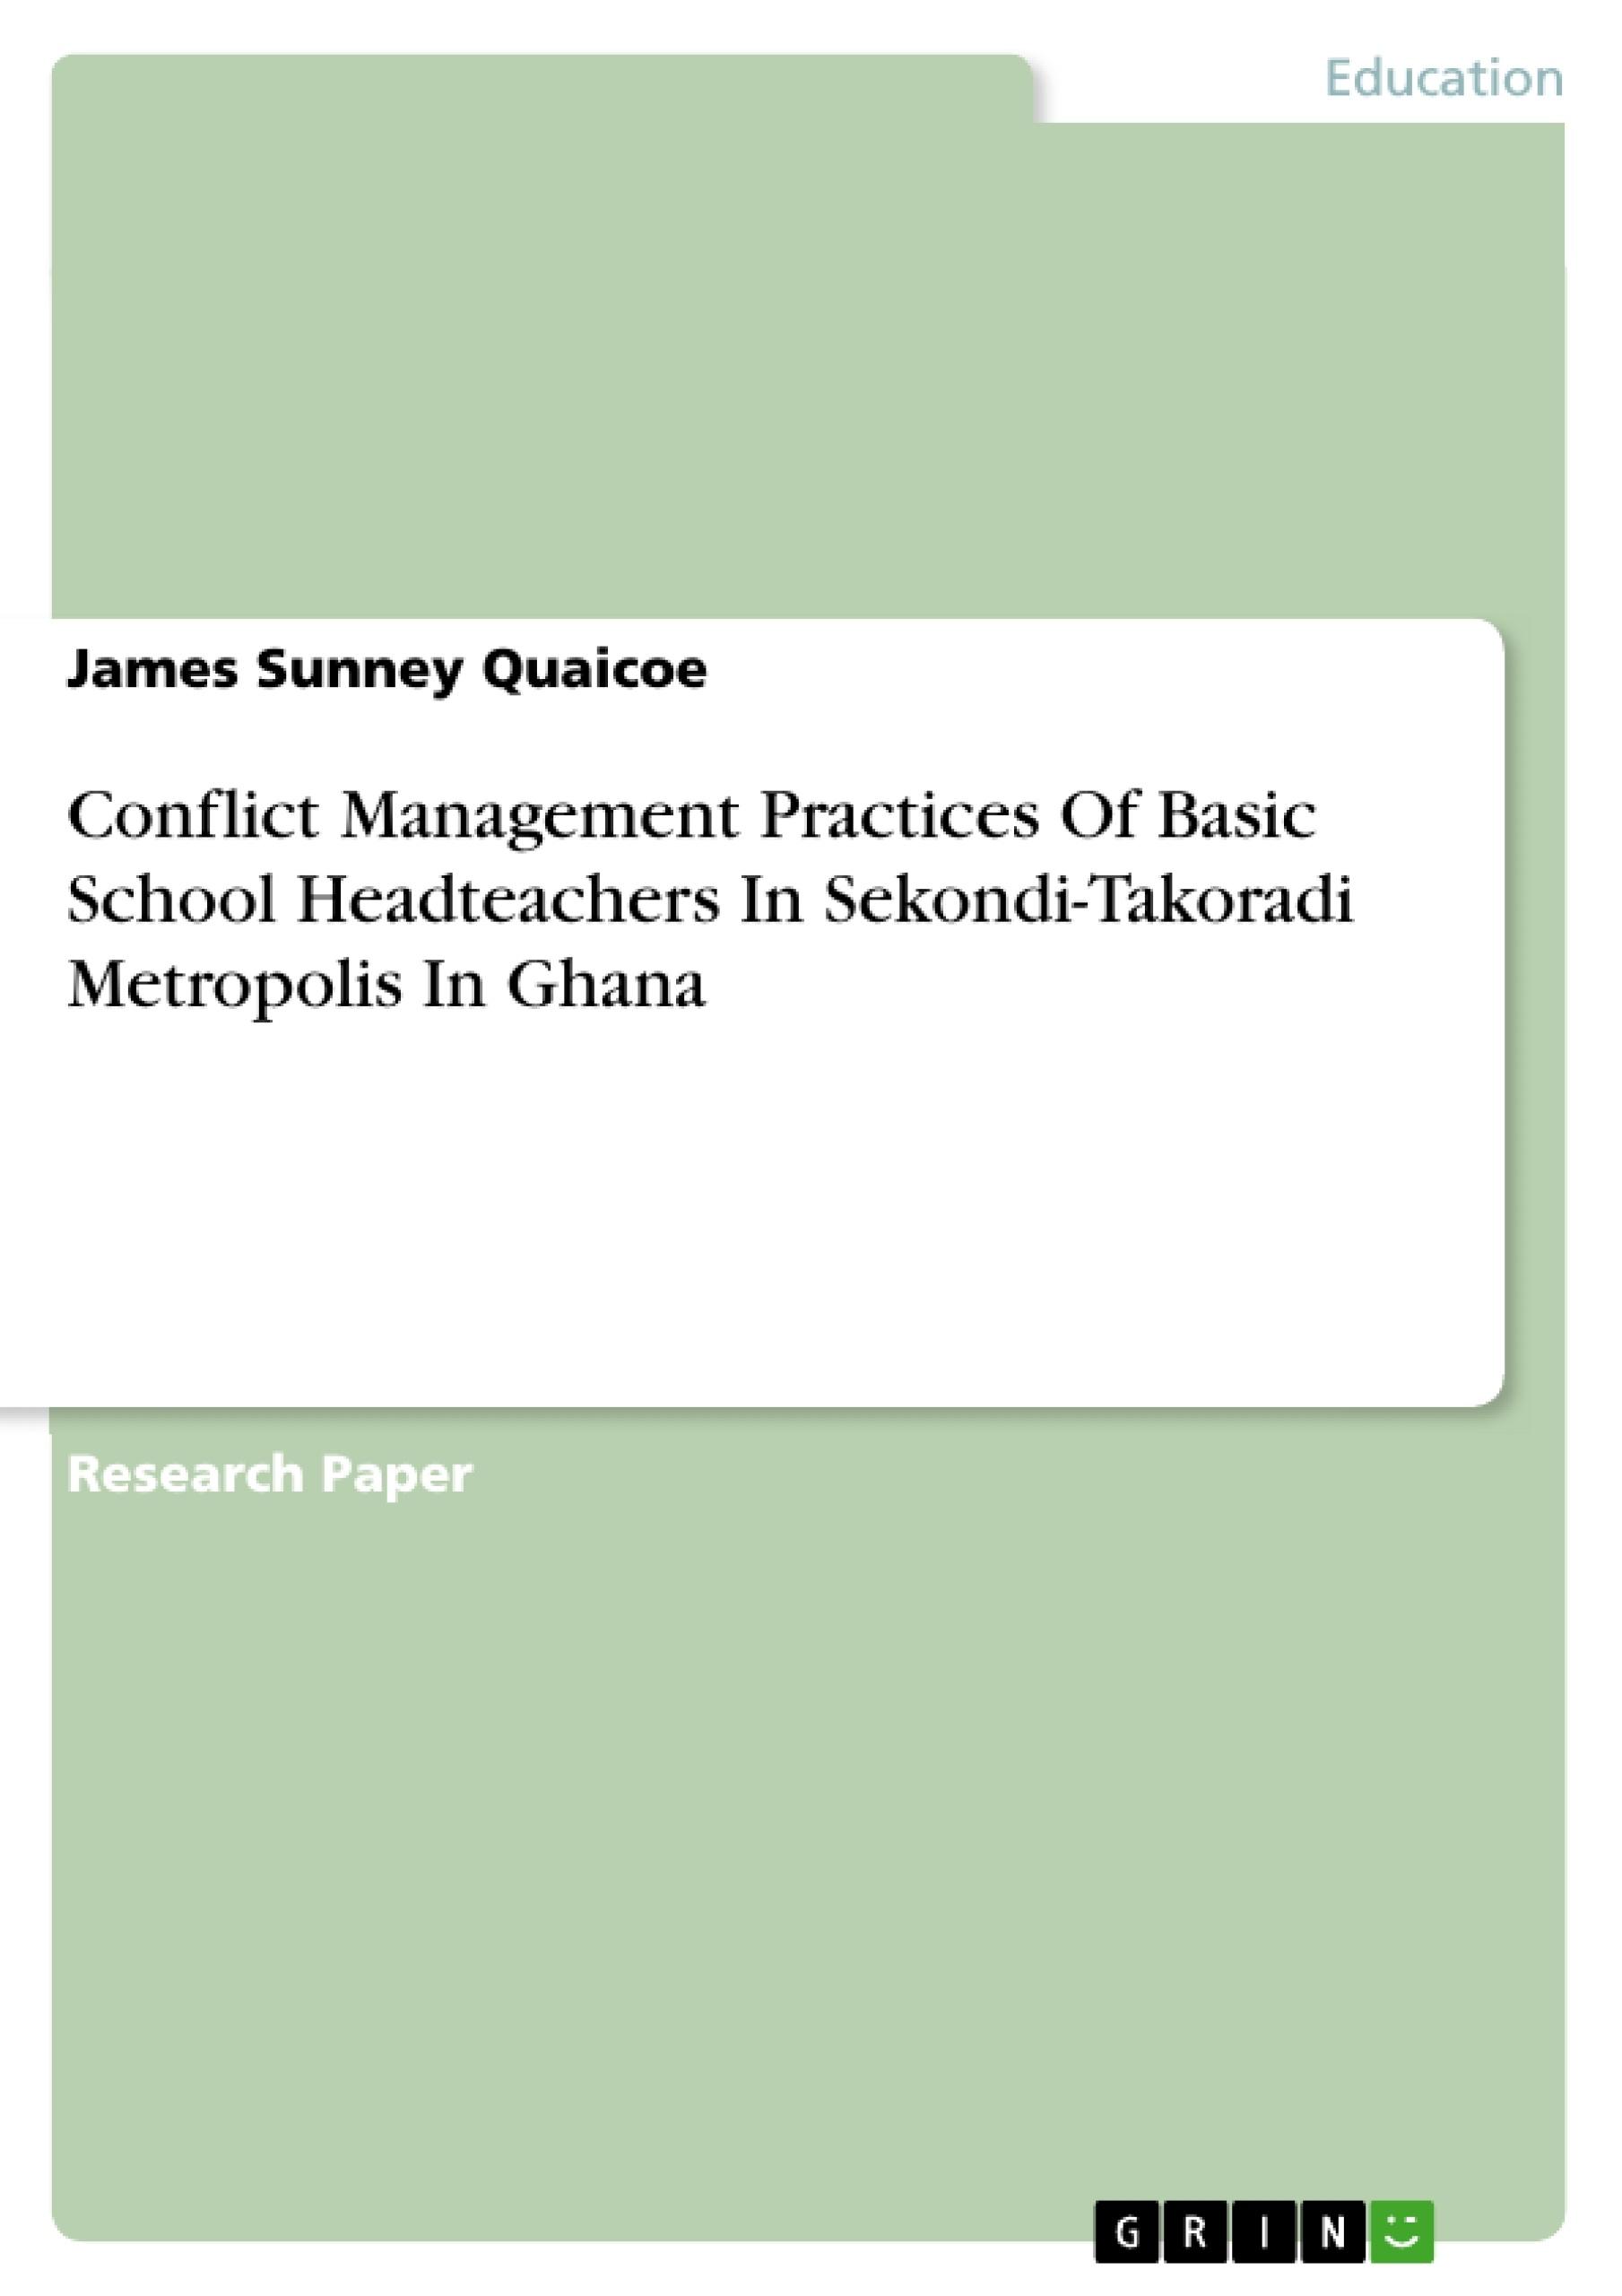 Title: Conflict Management Practices Of Basic School Headteachers In Sekondi-Takoradi Metropolis In Ghana